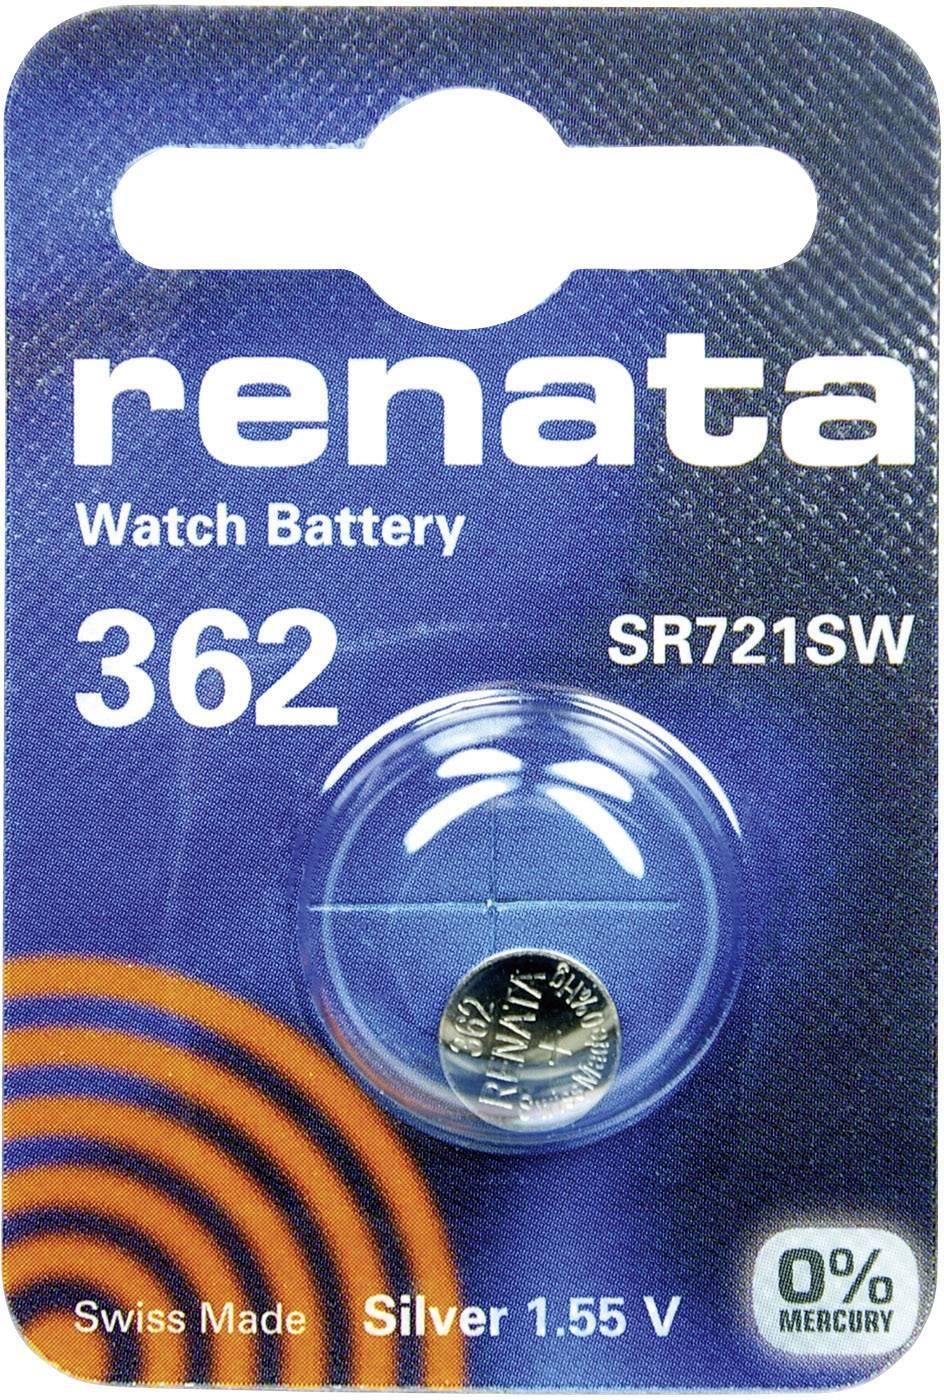 Knoflíková baterie 362, Renata SR58, na bázi oxidu stříbra, 362.CU MF